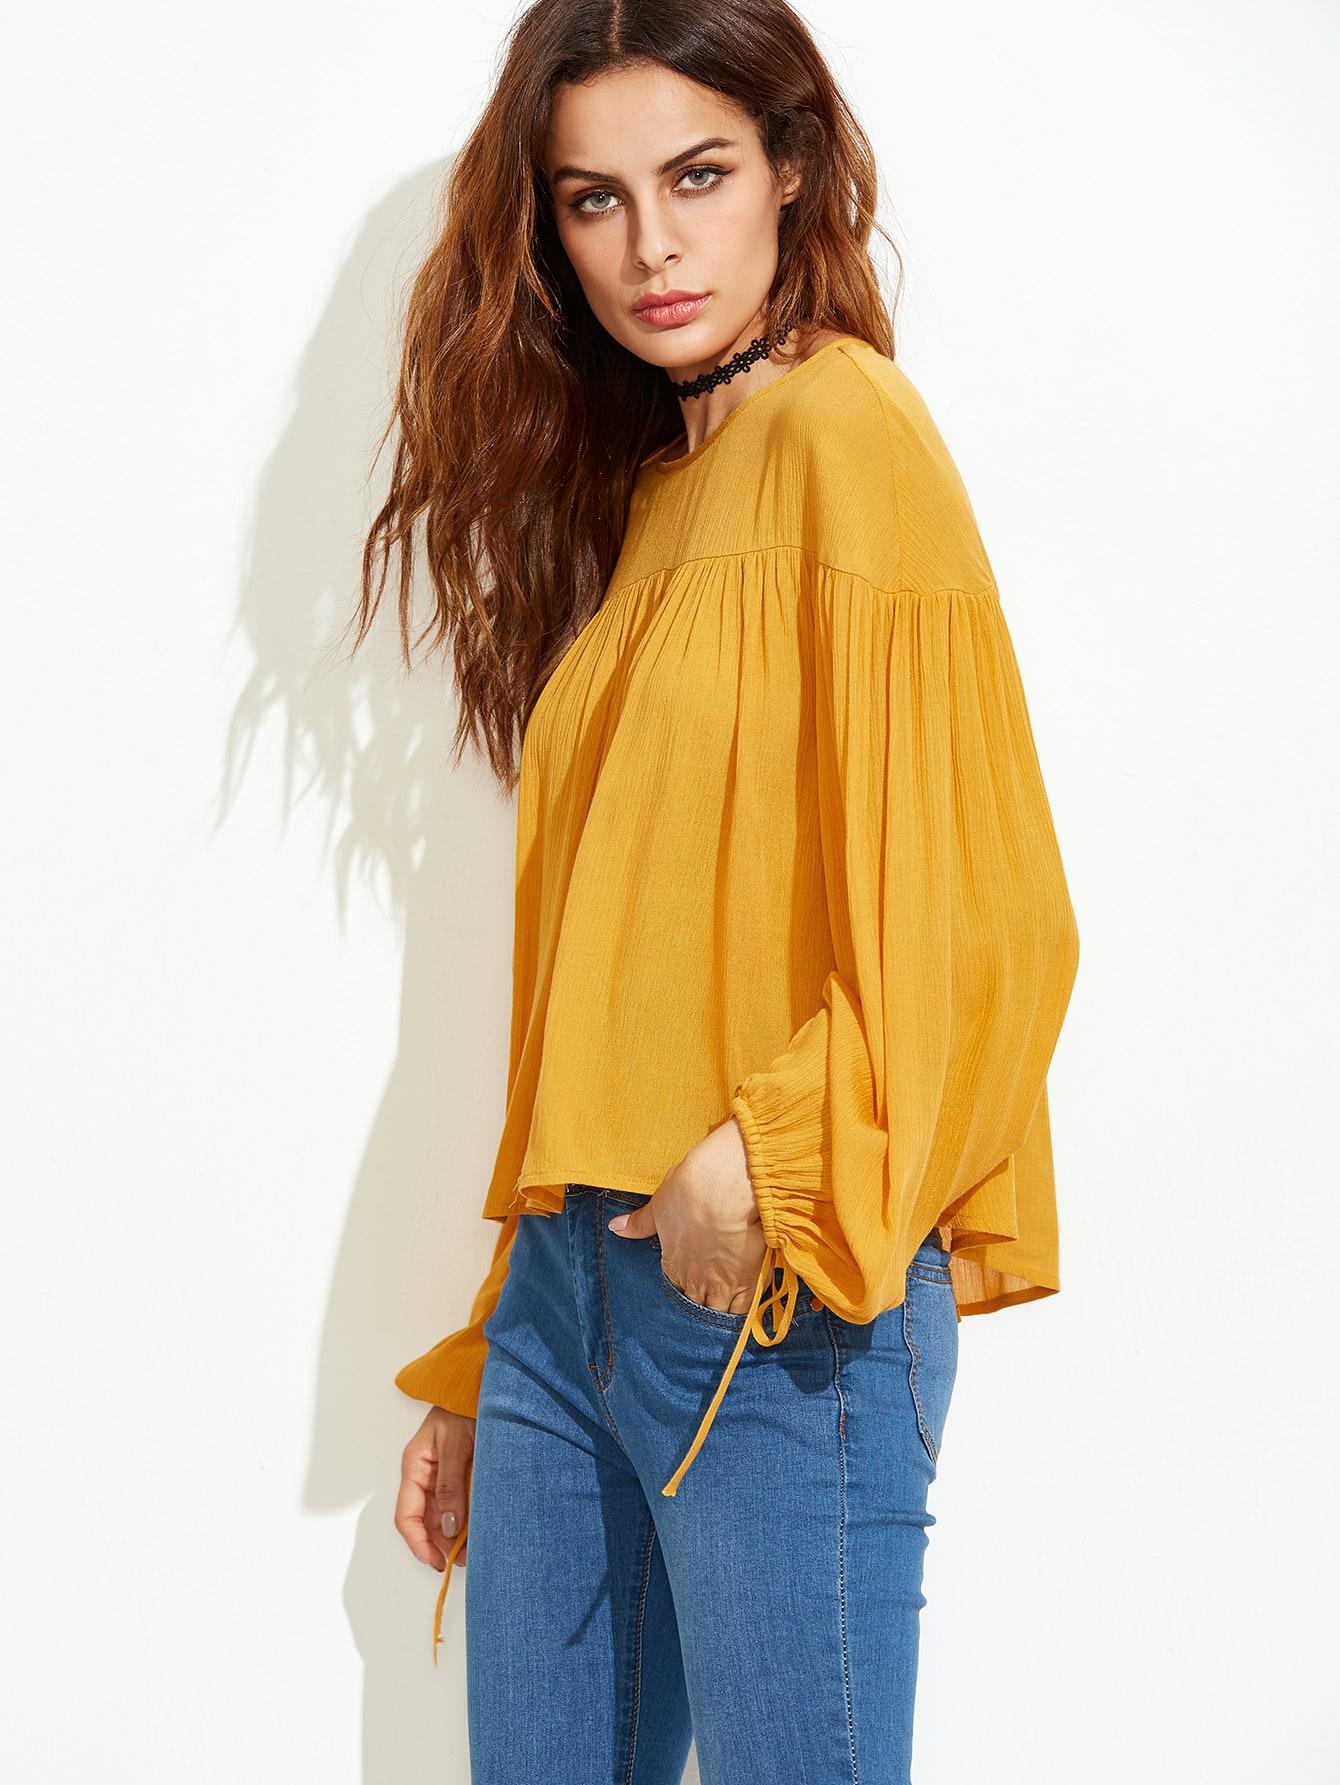 blouse160914504_2